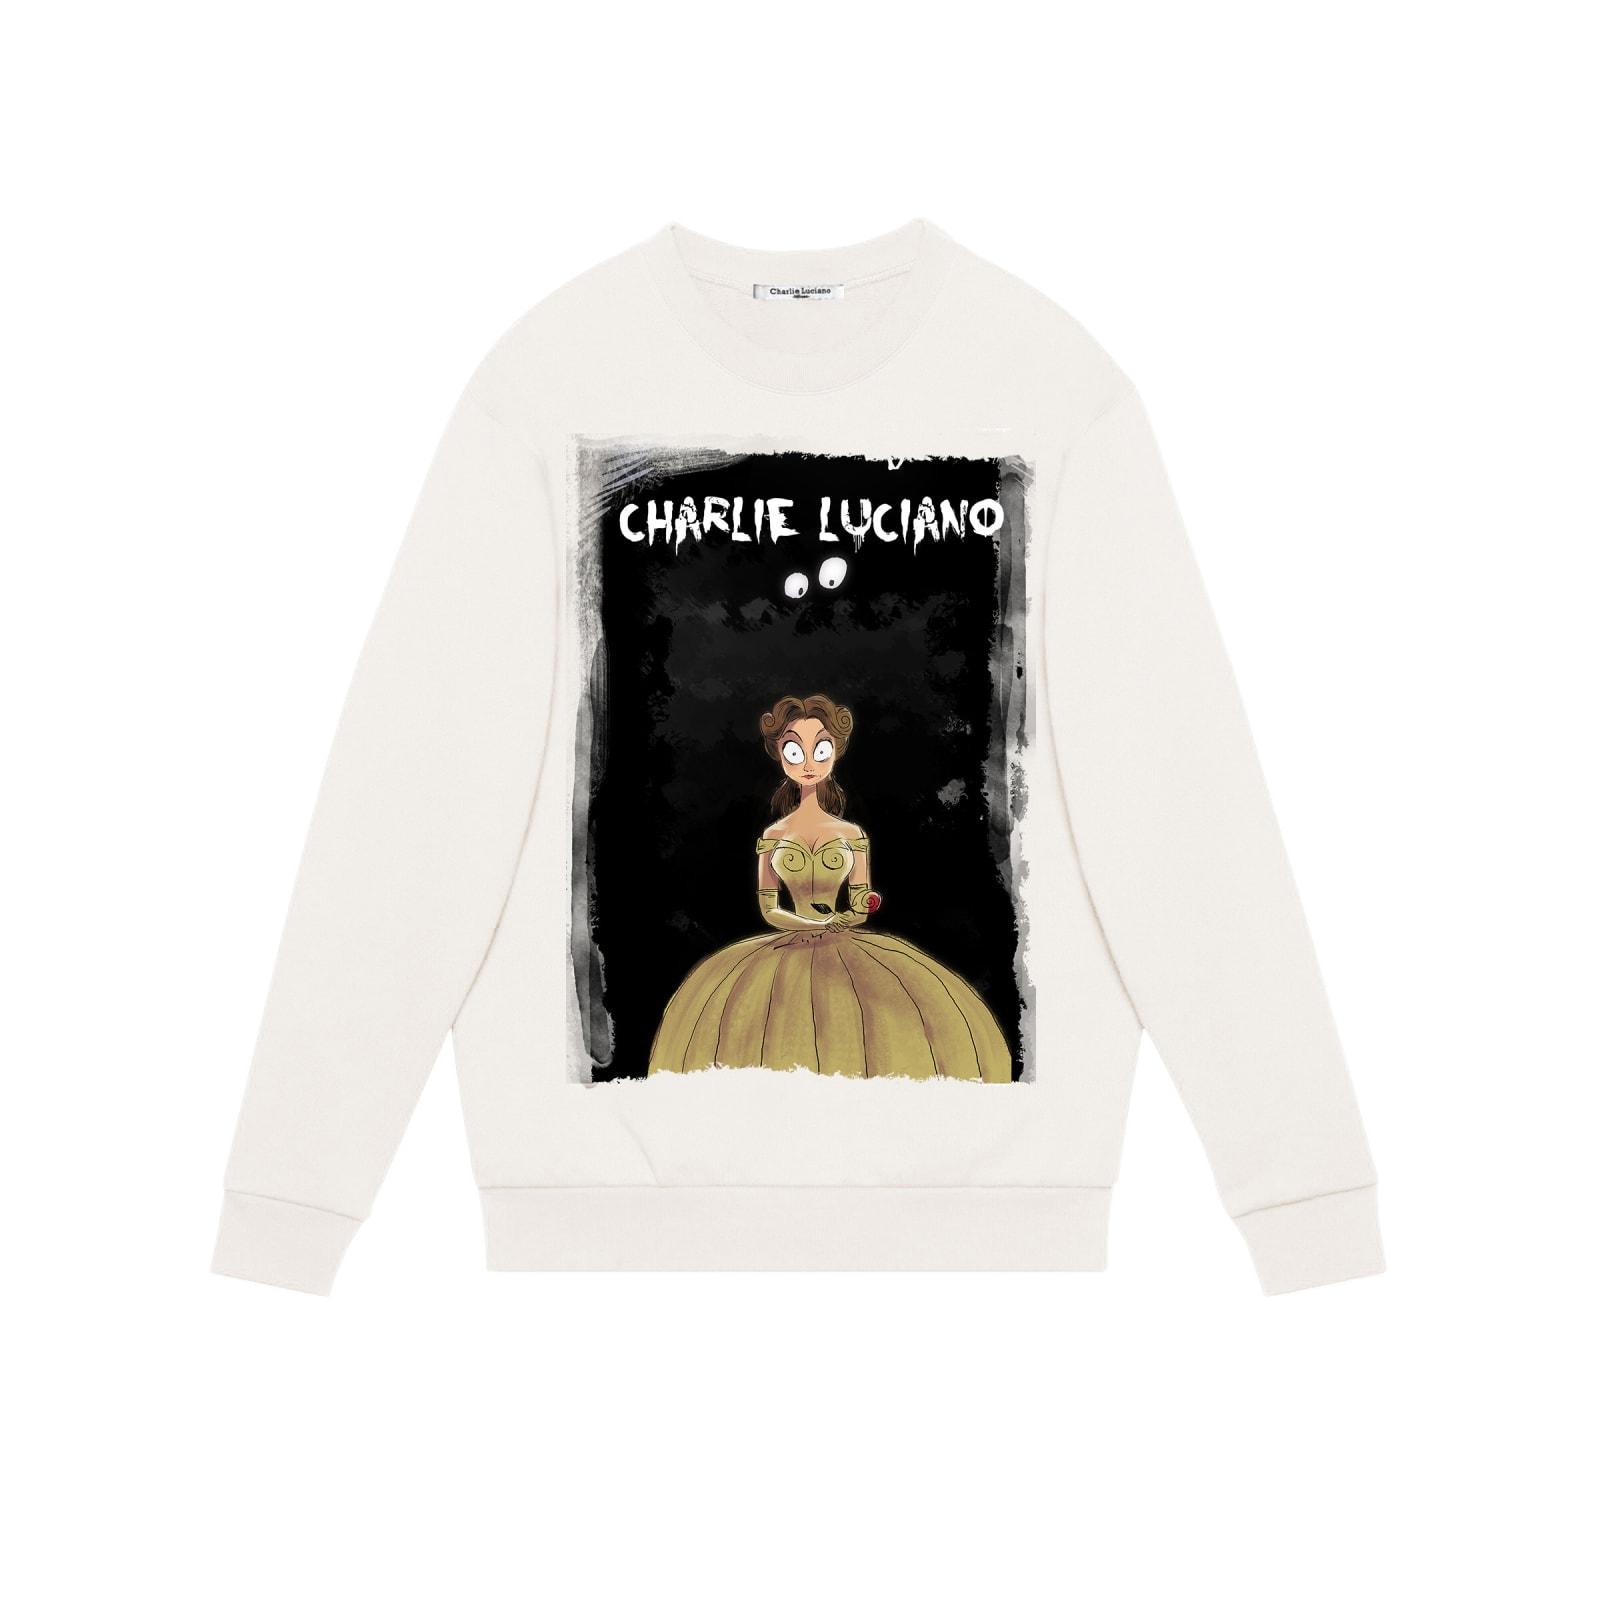 Charlie Luciano Beast Unisex Print Sweatshirt